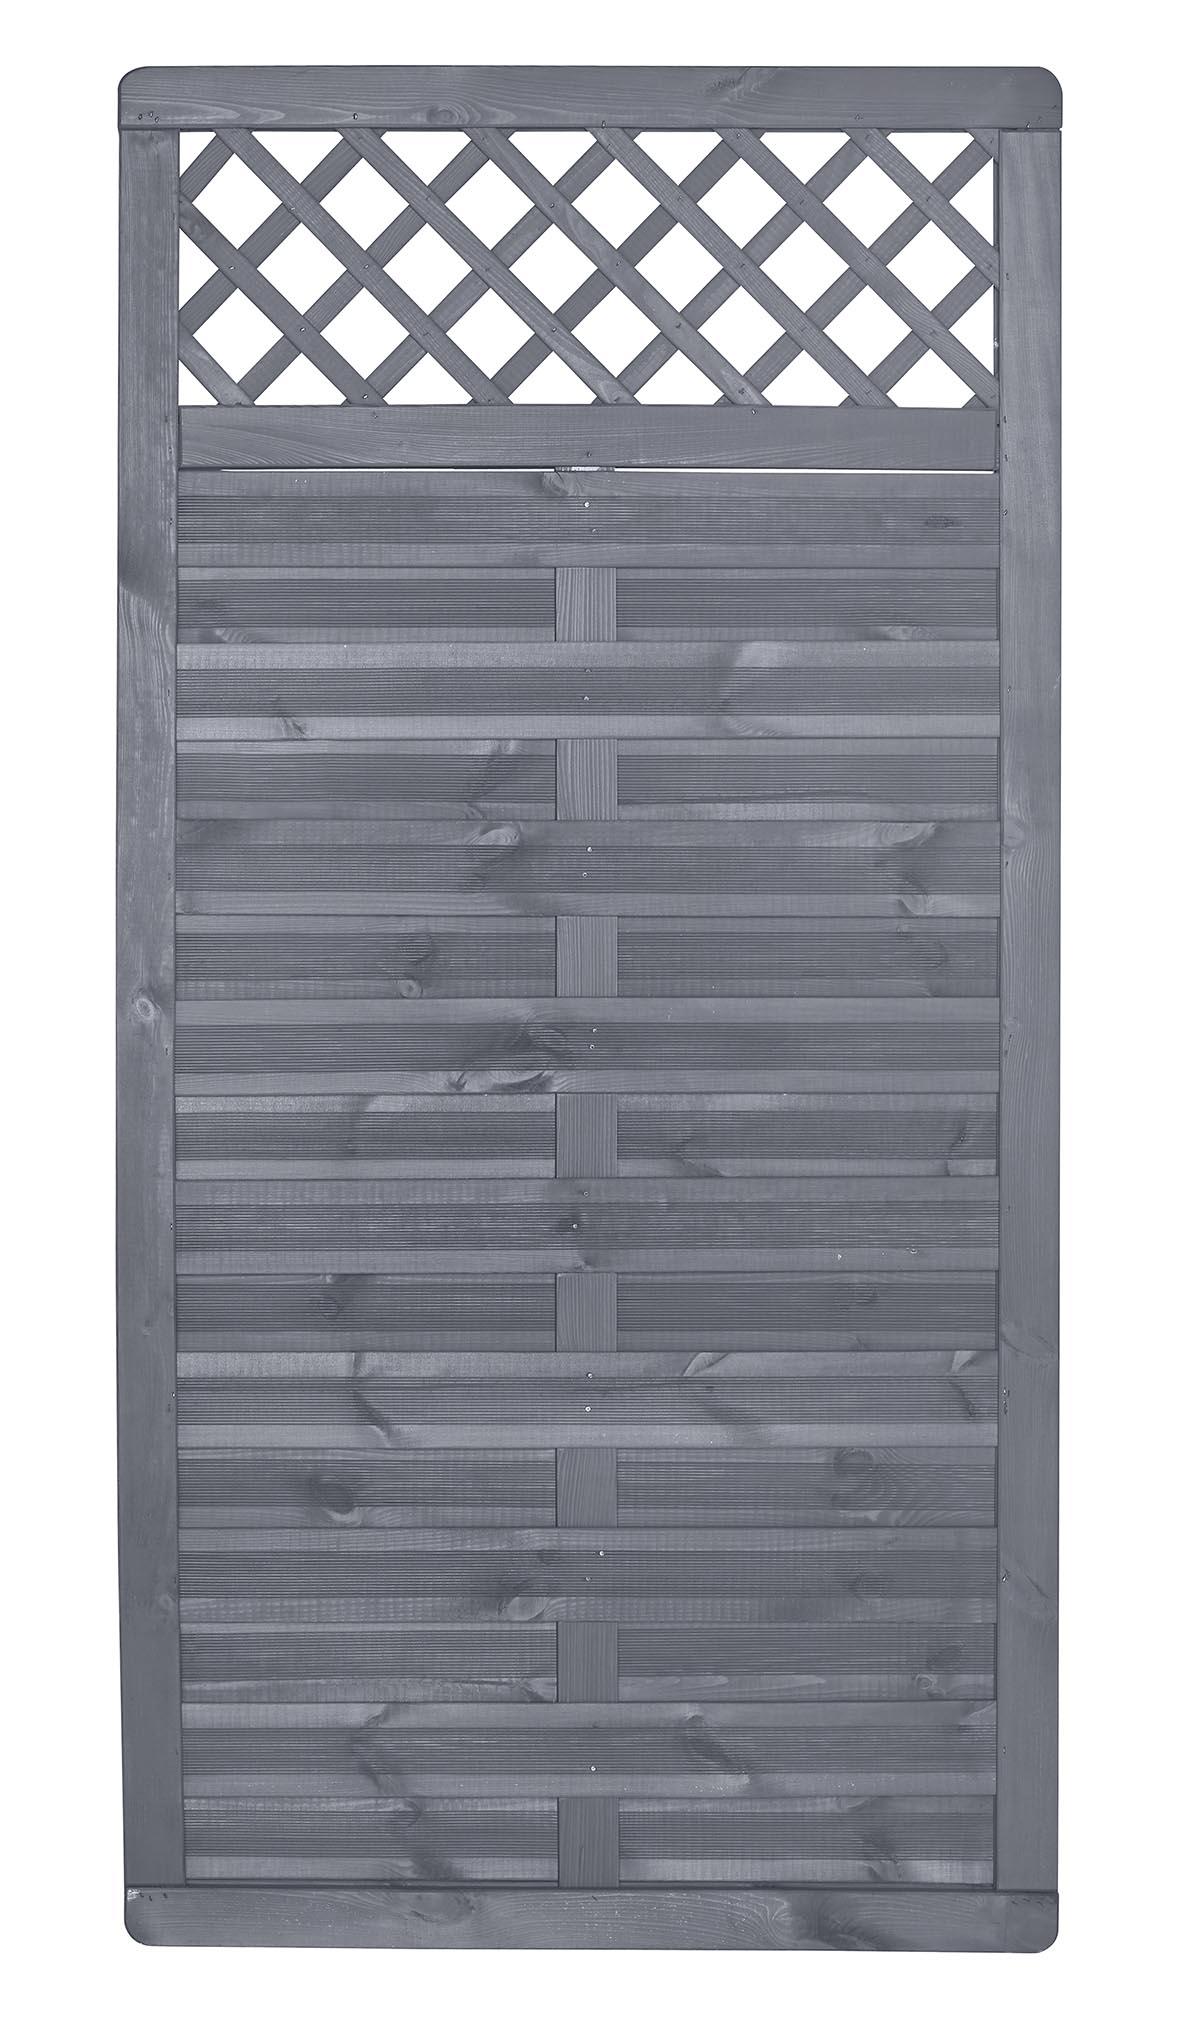 Sichtschutzelement Licata Grau Lasiert Holz Sichtschutz Sichtschutz Zaune Gartenwelt Holz Braun